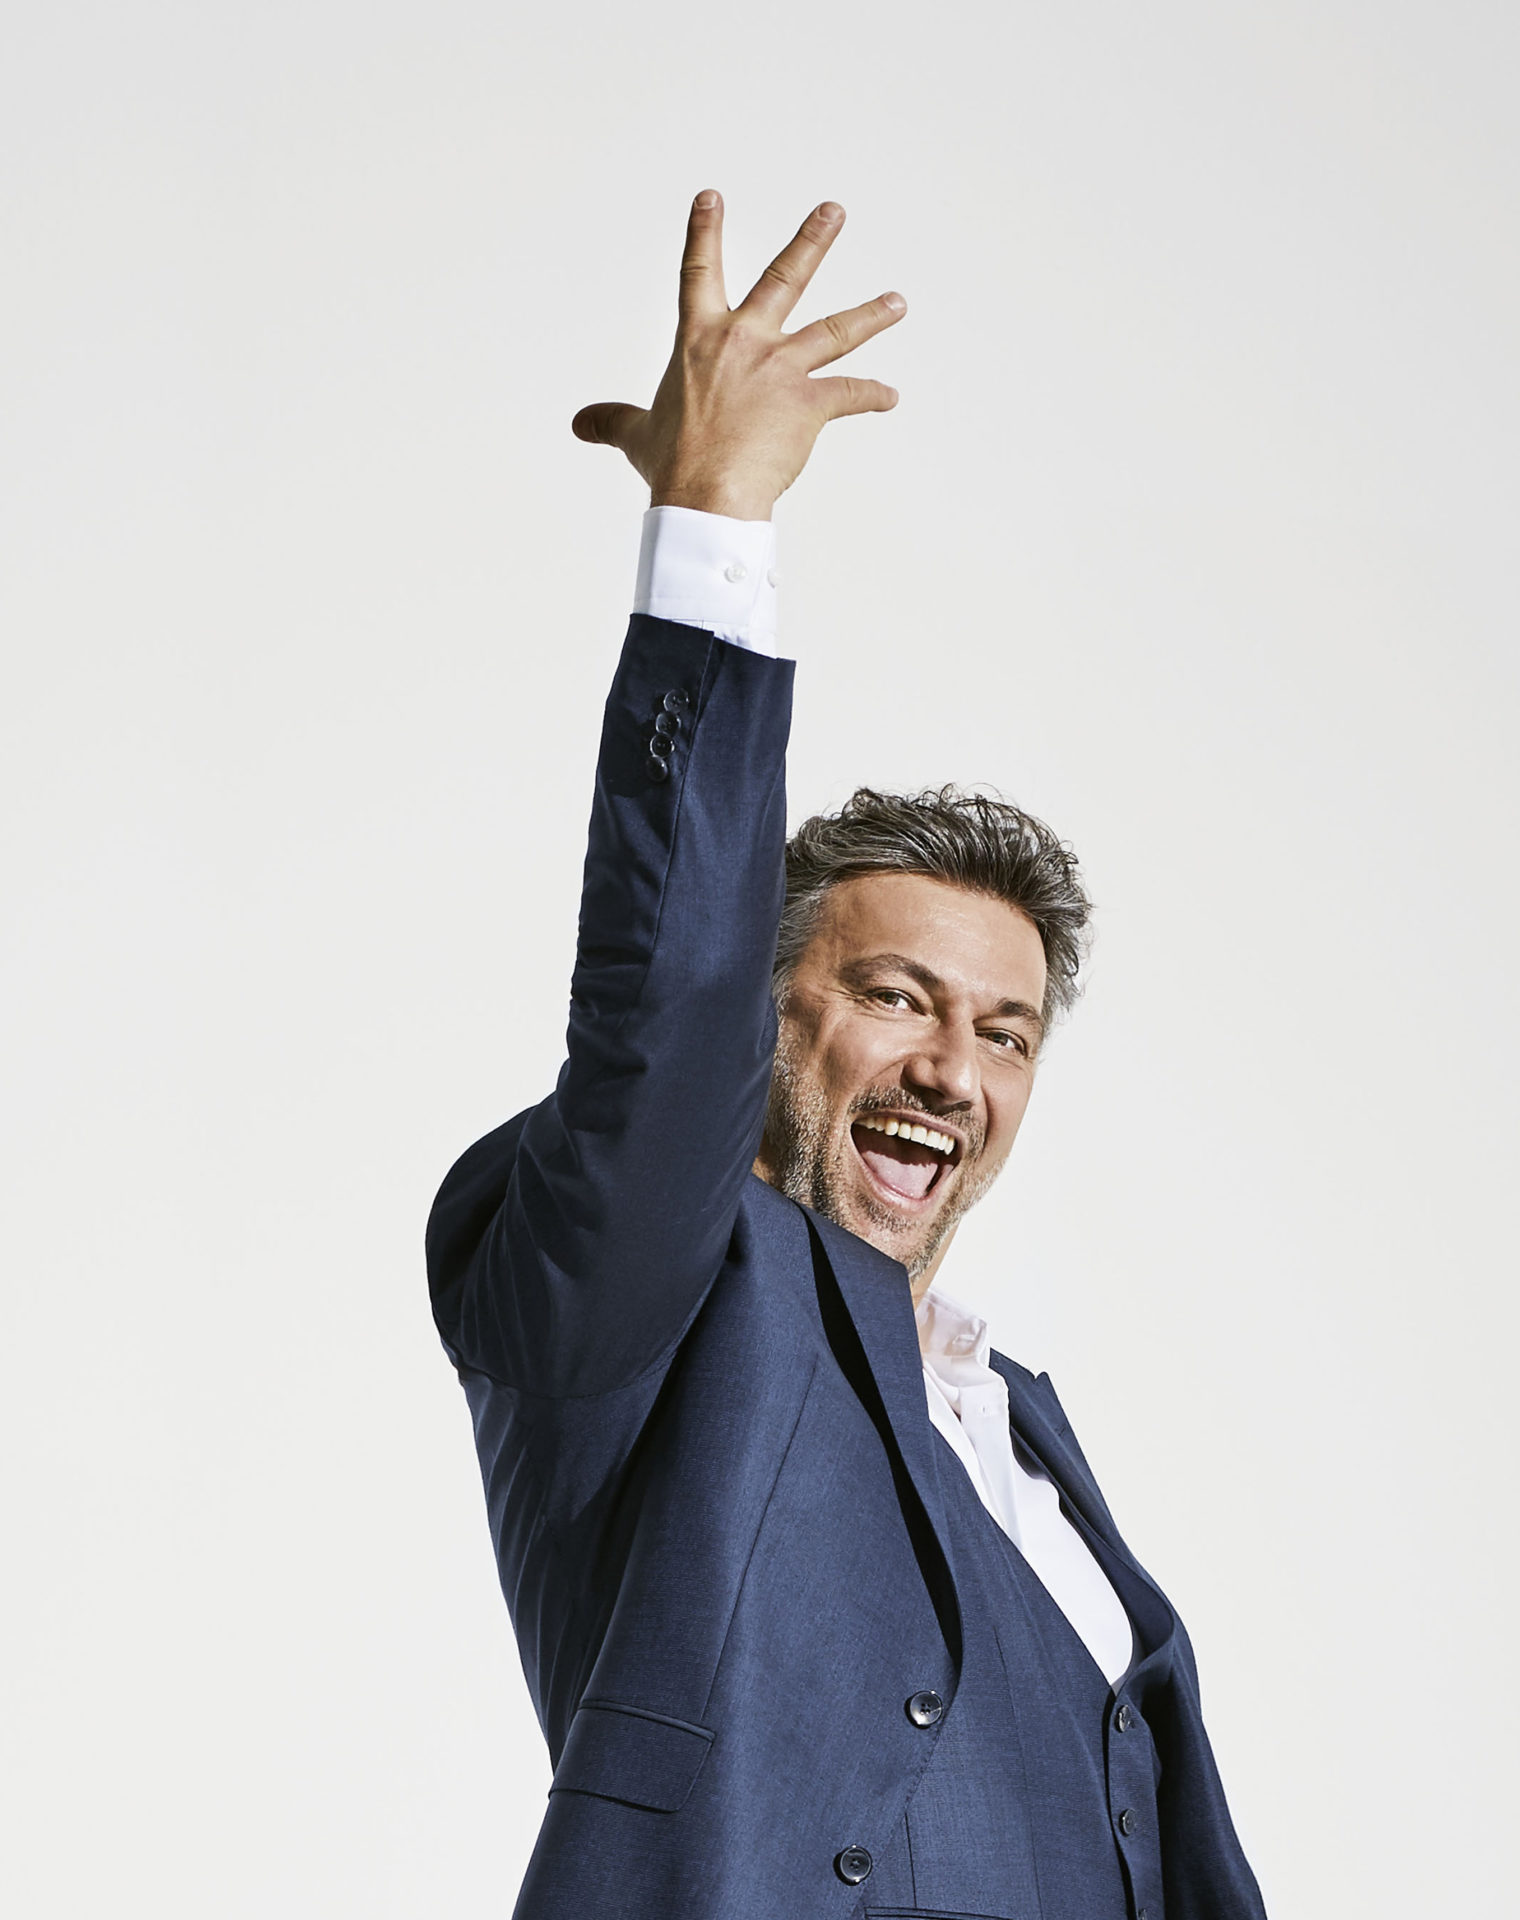 Jonas Kaufmann sagt prestigereiche Radioaufnahme in Paris ab  Opéra national de Paris, 20. November 2020